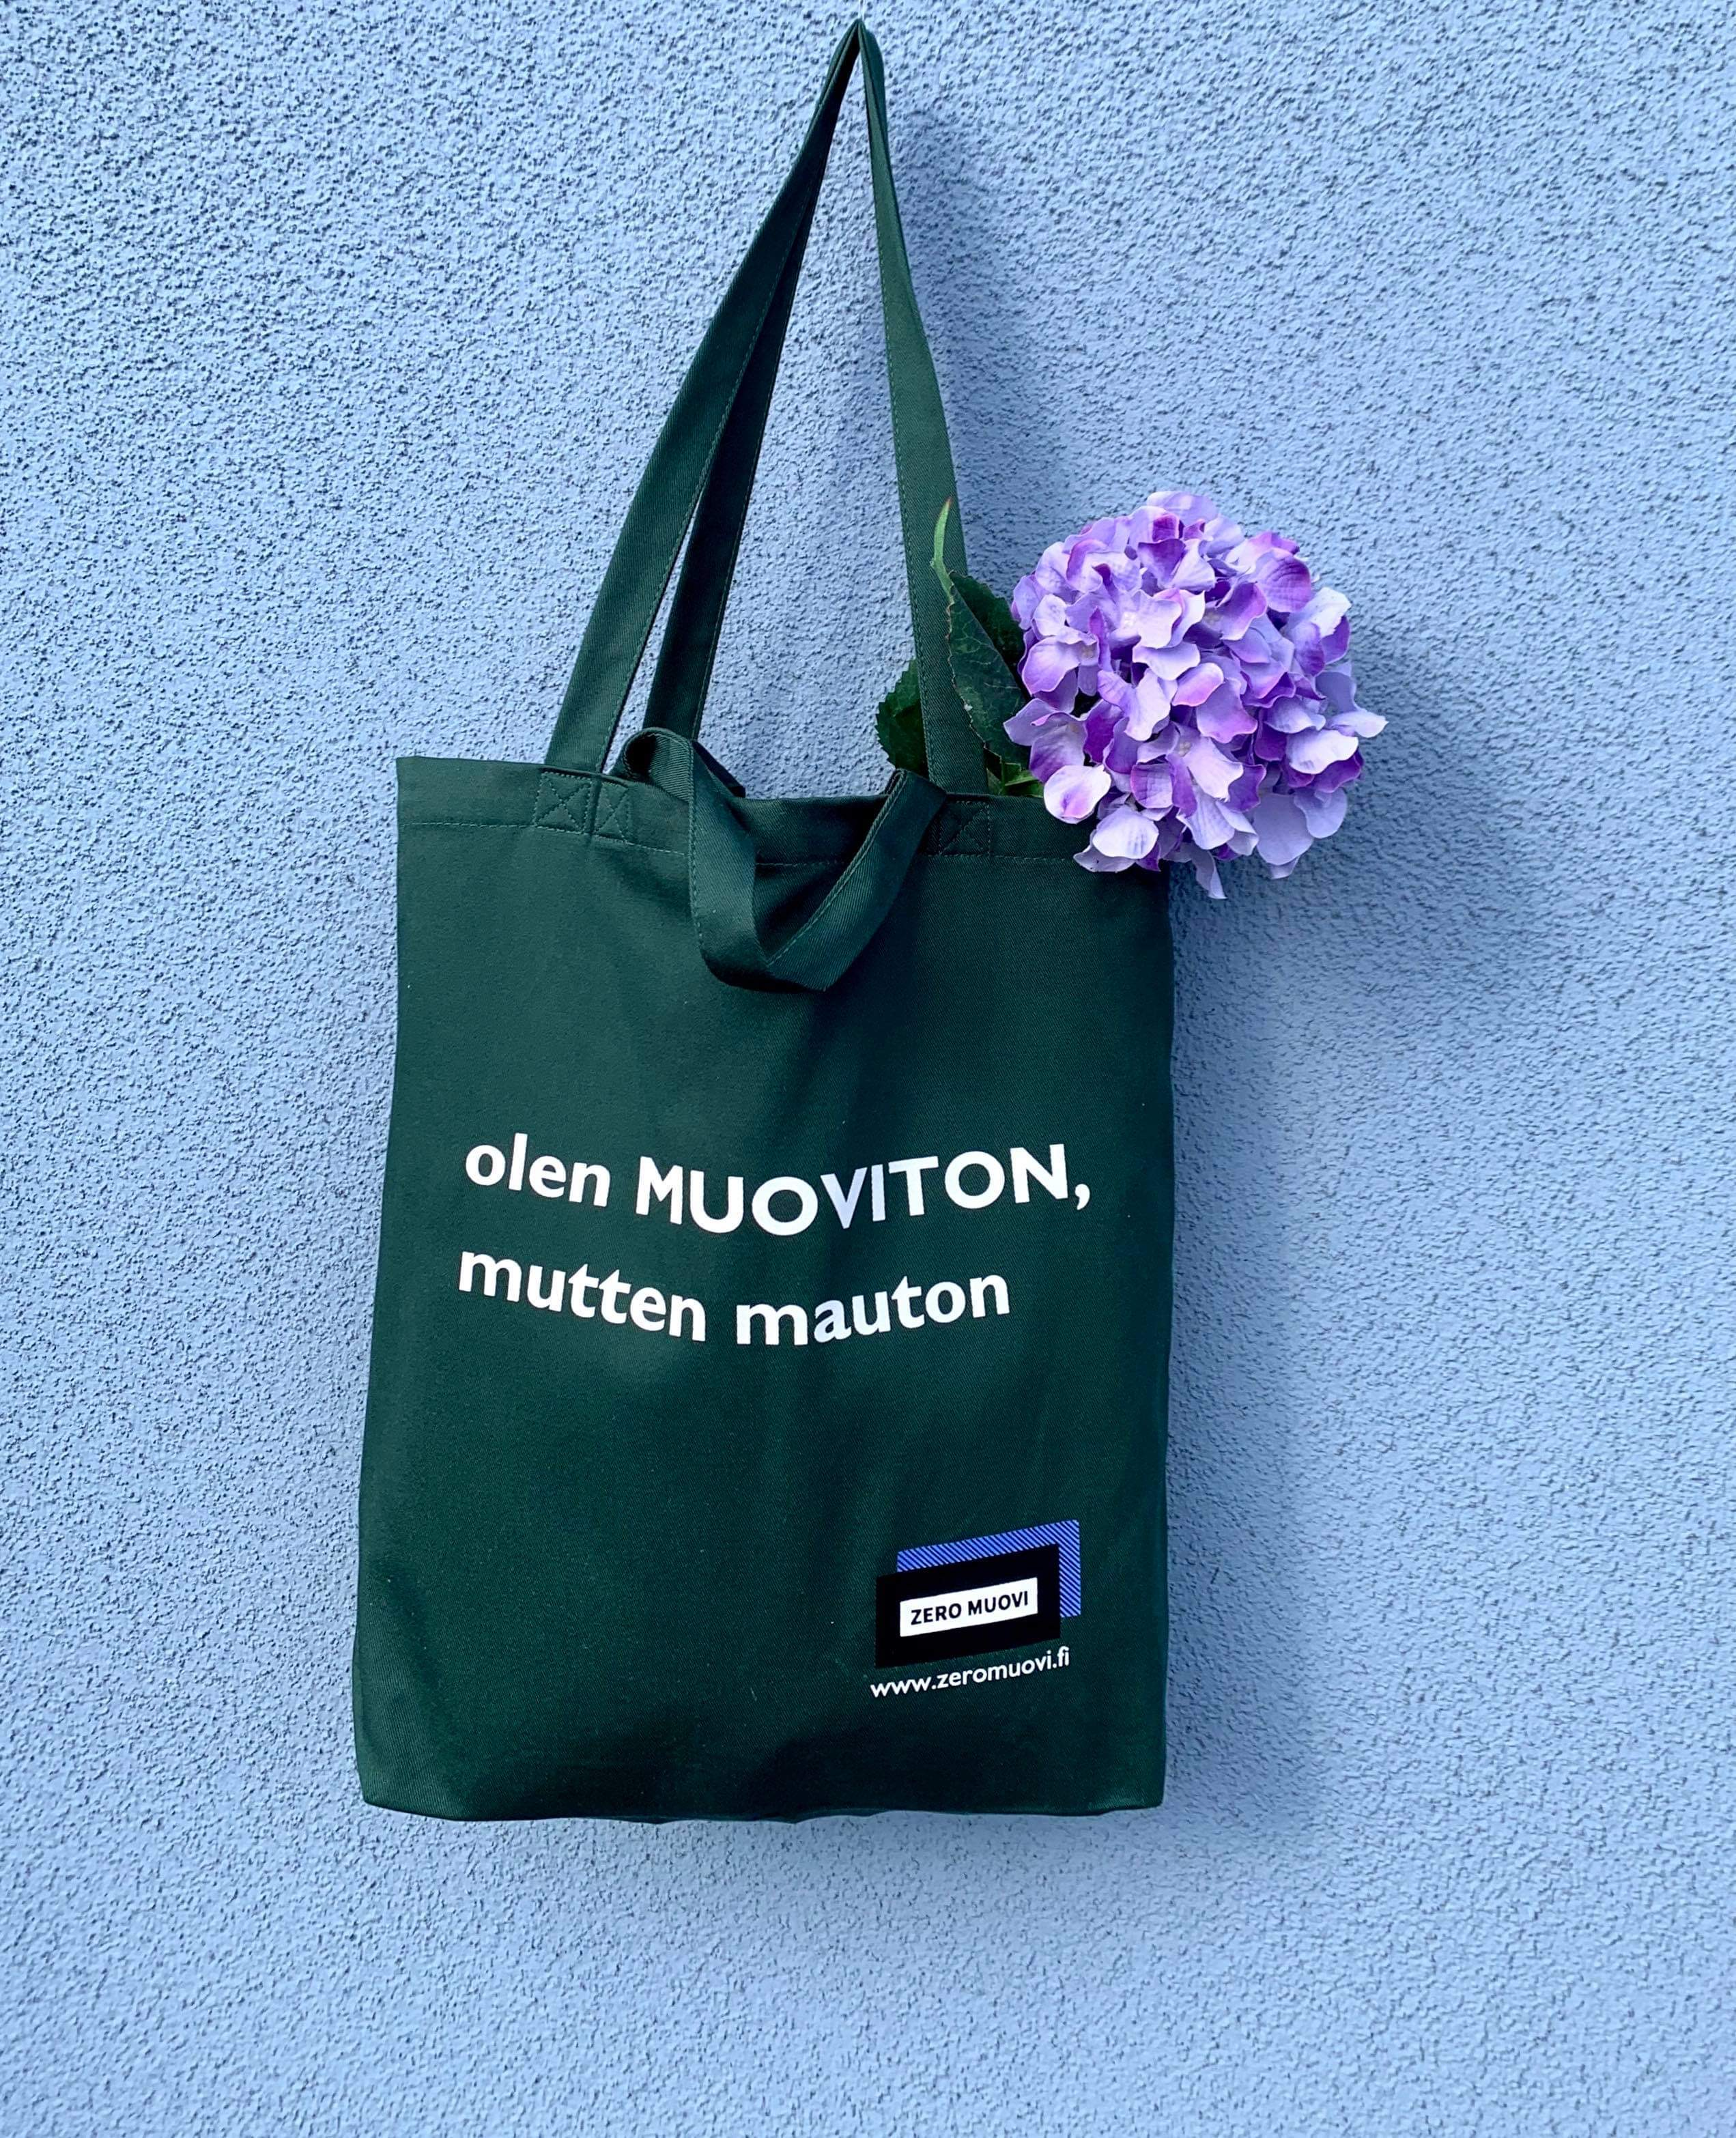 Tote Bag -olen MUOVTION muttei mauton